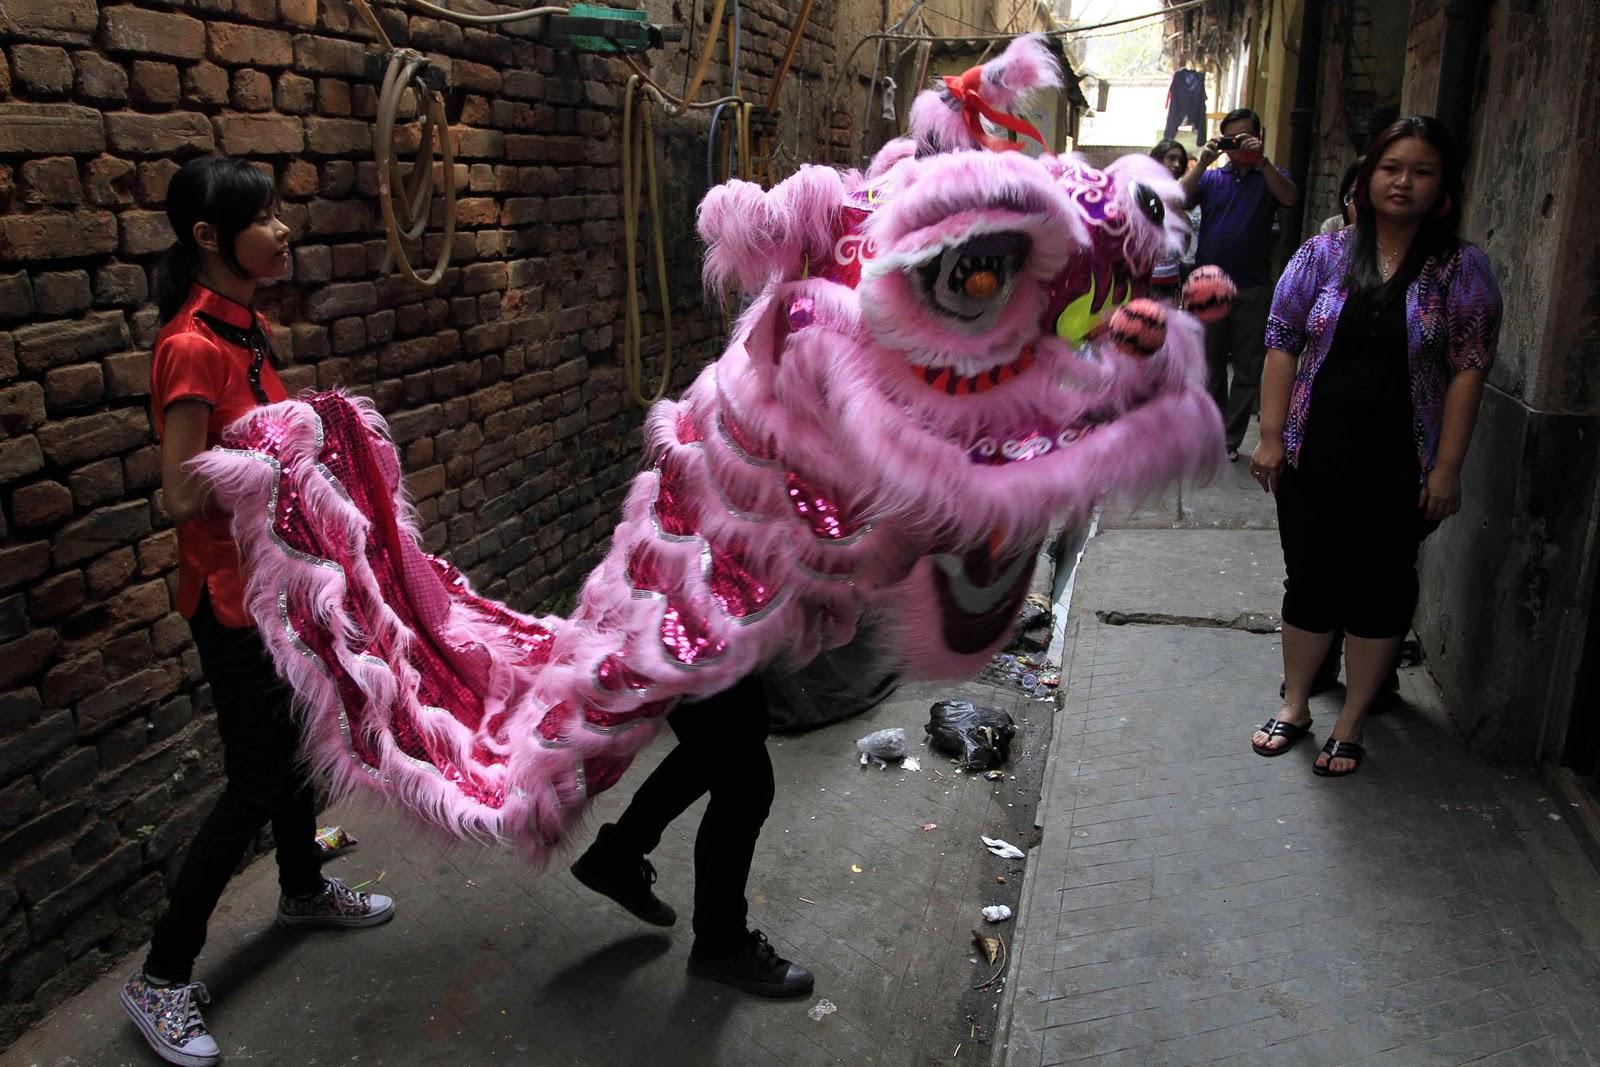 http://4.bp.blogspot.com/_WjviWf8OeLI/TUrfocAzmhI/AAAAAAAAAHs/rL8MmVkcokE/s1600/India%2527s+pink+dragon.jpg